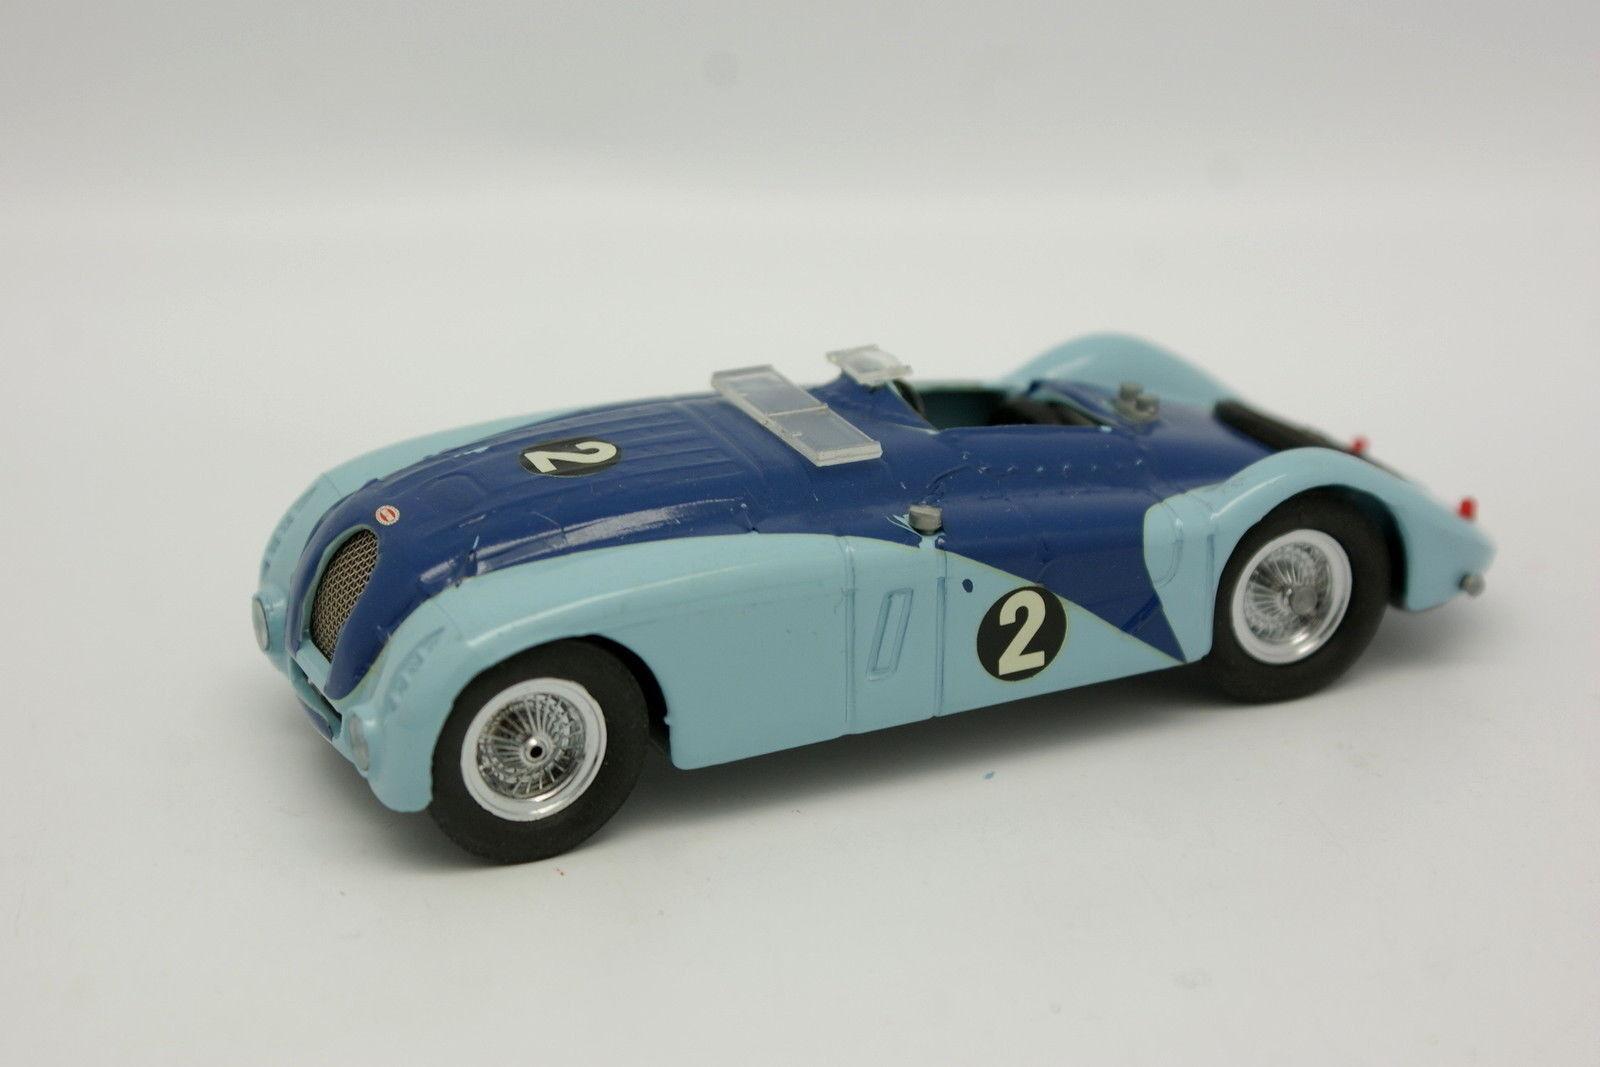 Parkway 1 43 - Bugatti 57s tank le mans 1937